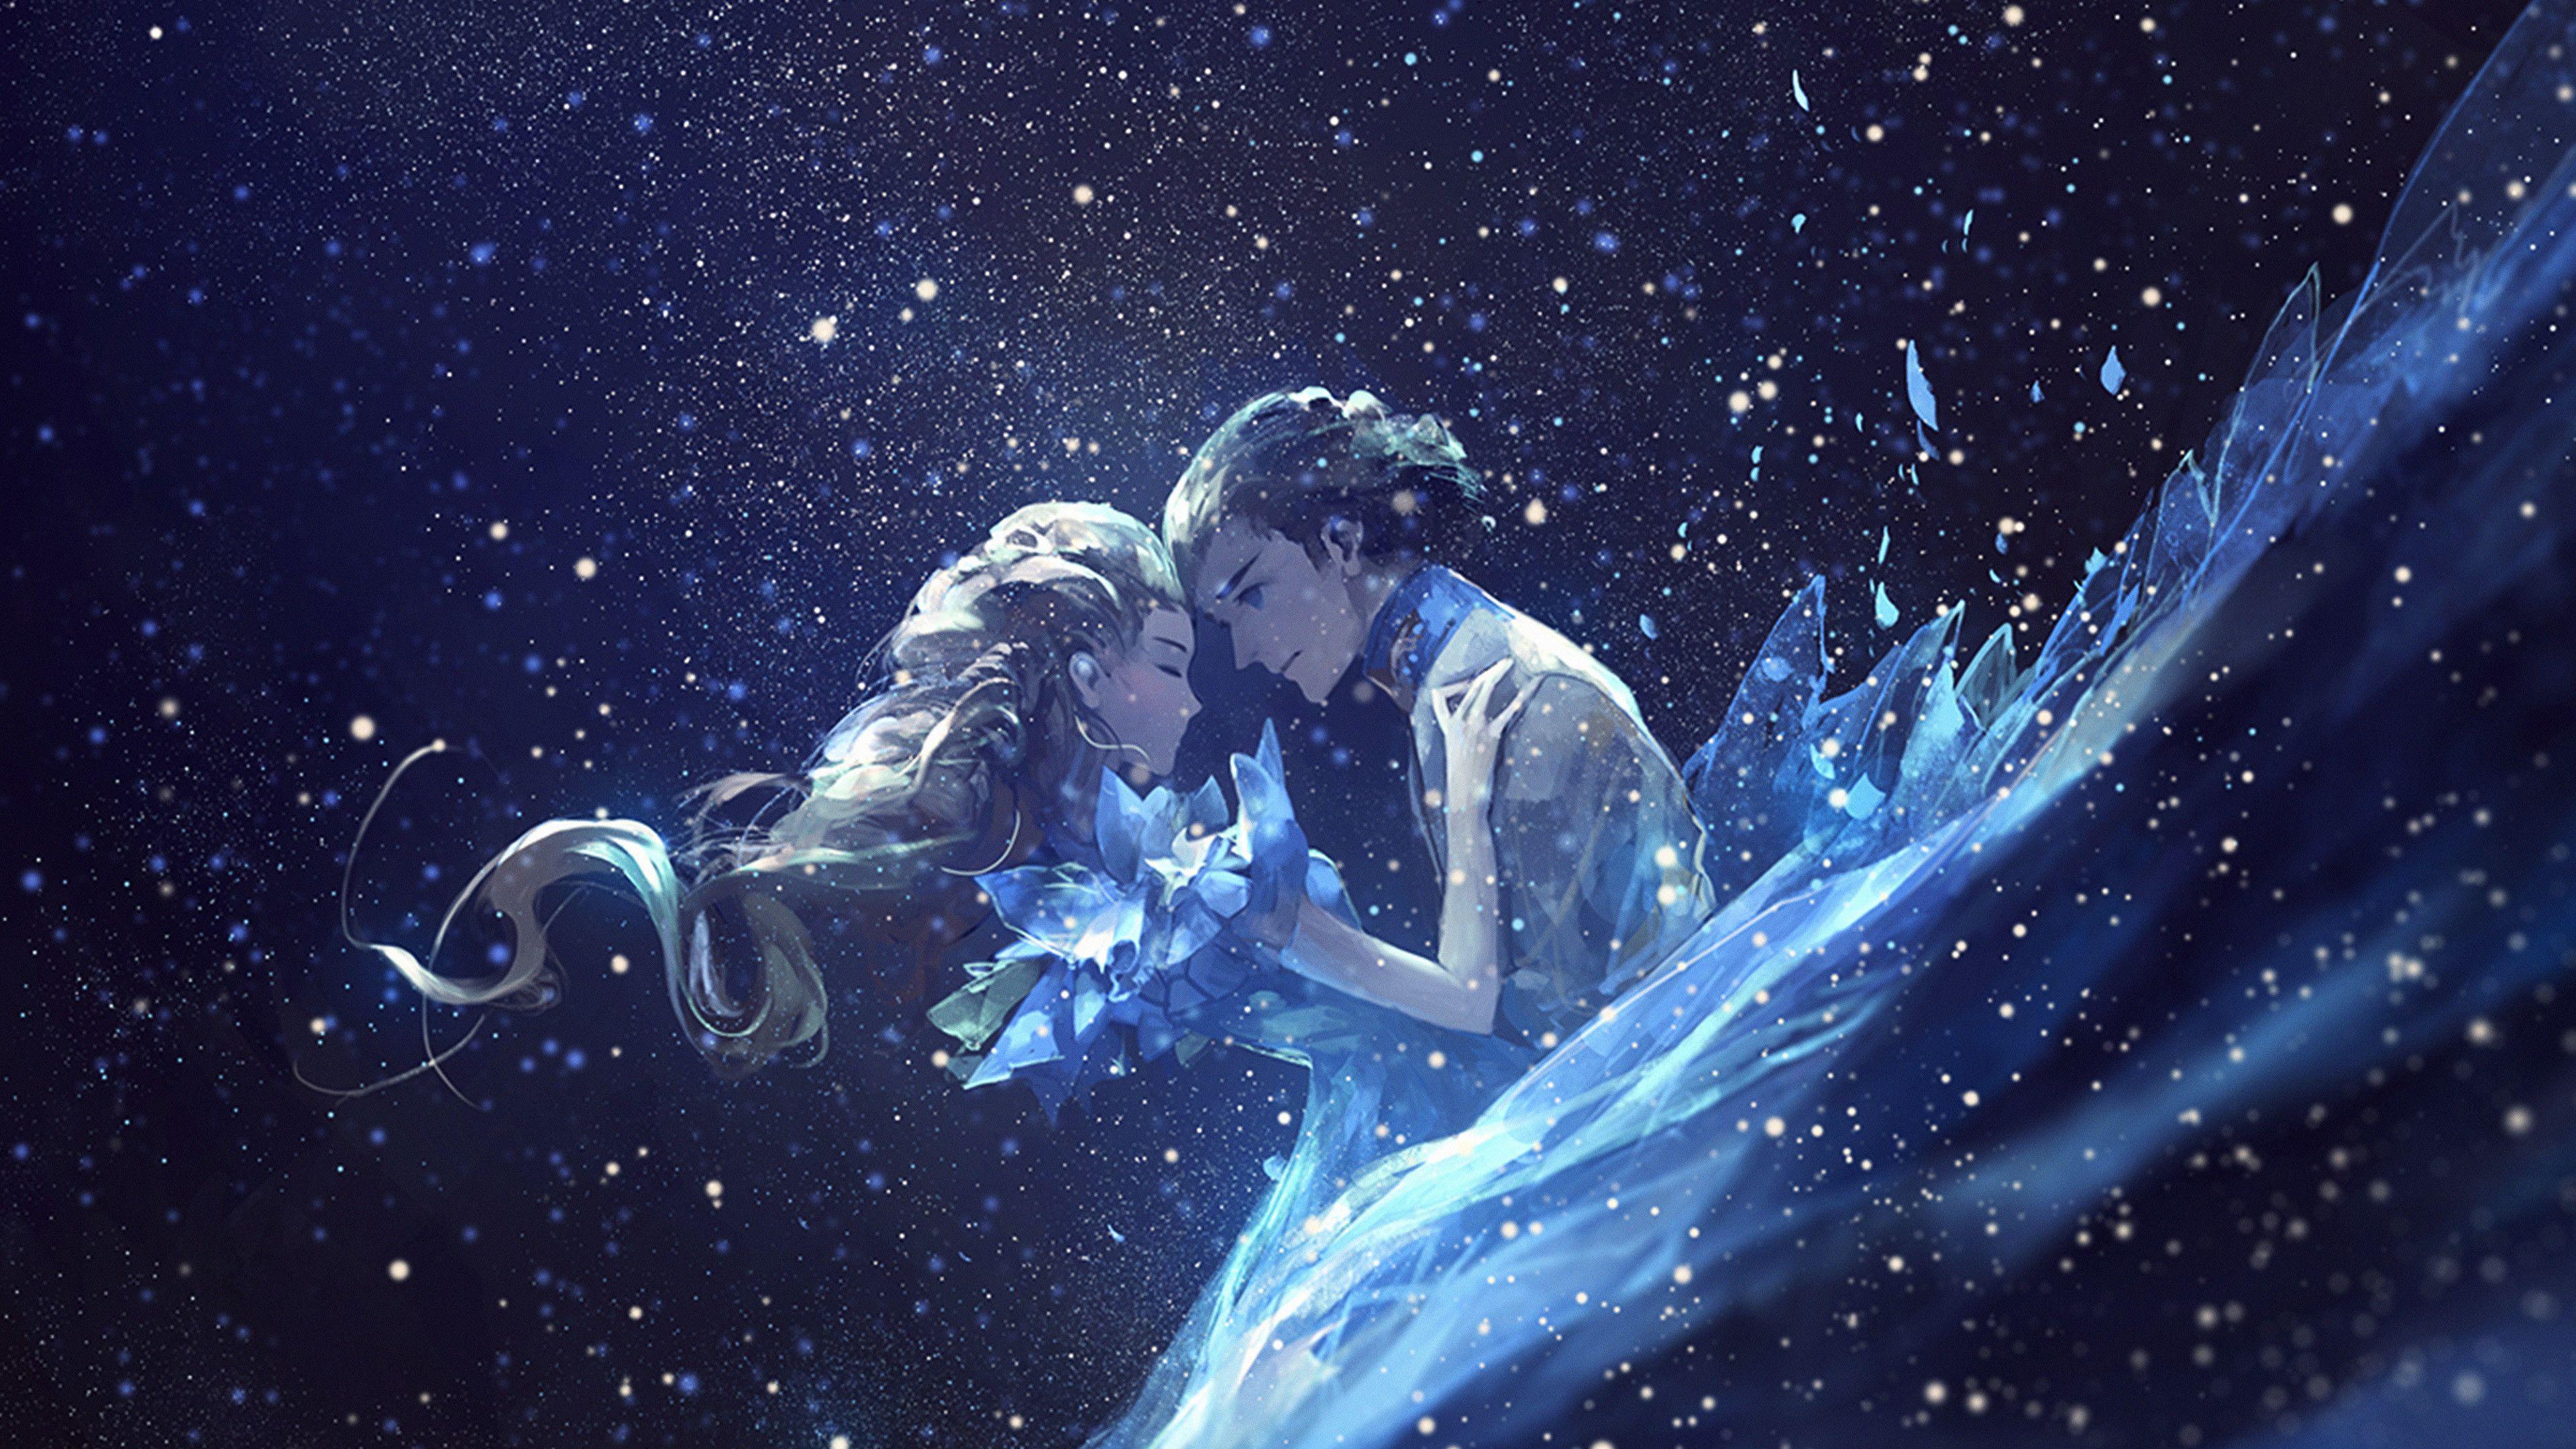 Gambar Anime Romantis Wallpaper Top Anime Wallpaper In 2020 Anime Wallpaper Cinderella Wallpaper Romantic Anime